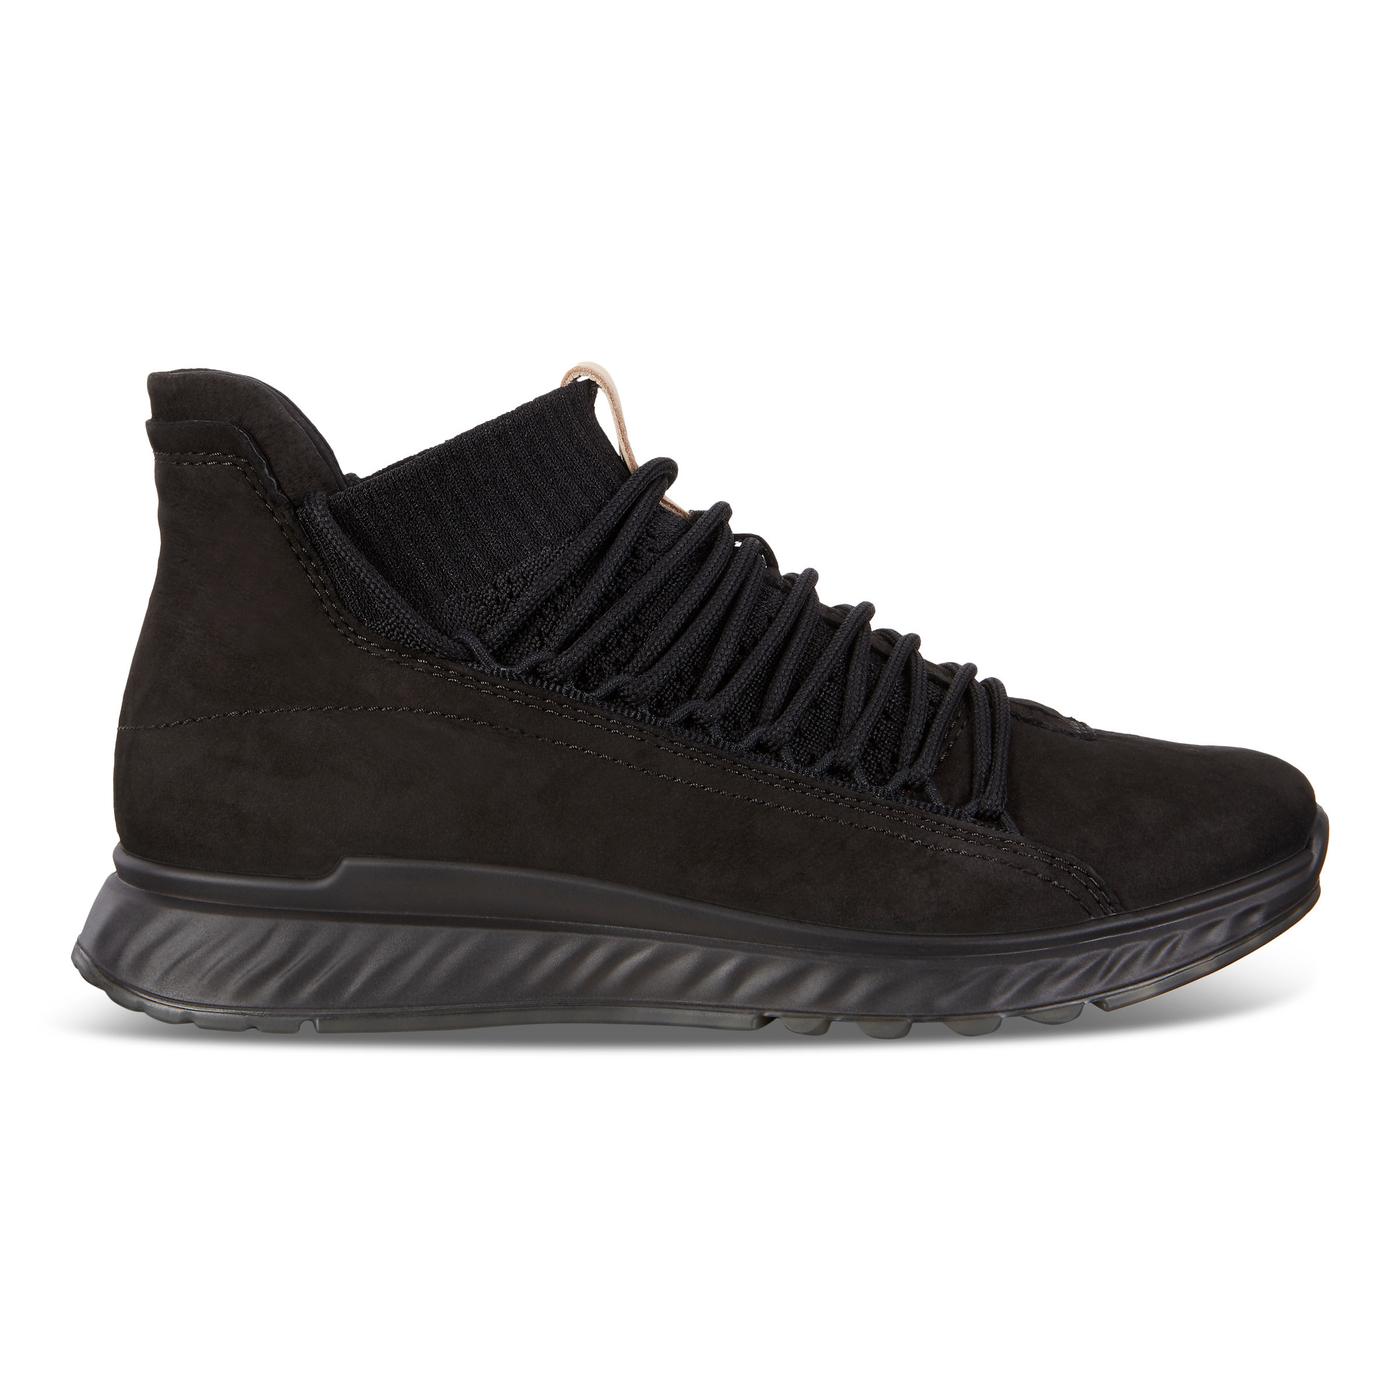 ECCO ST1 Womens Halo High Cut Street Sneaker